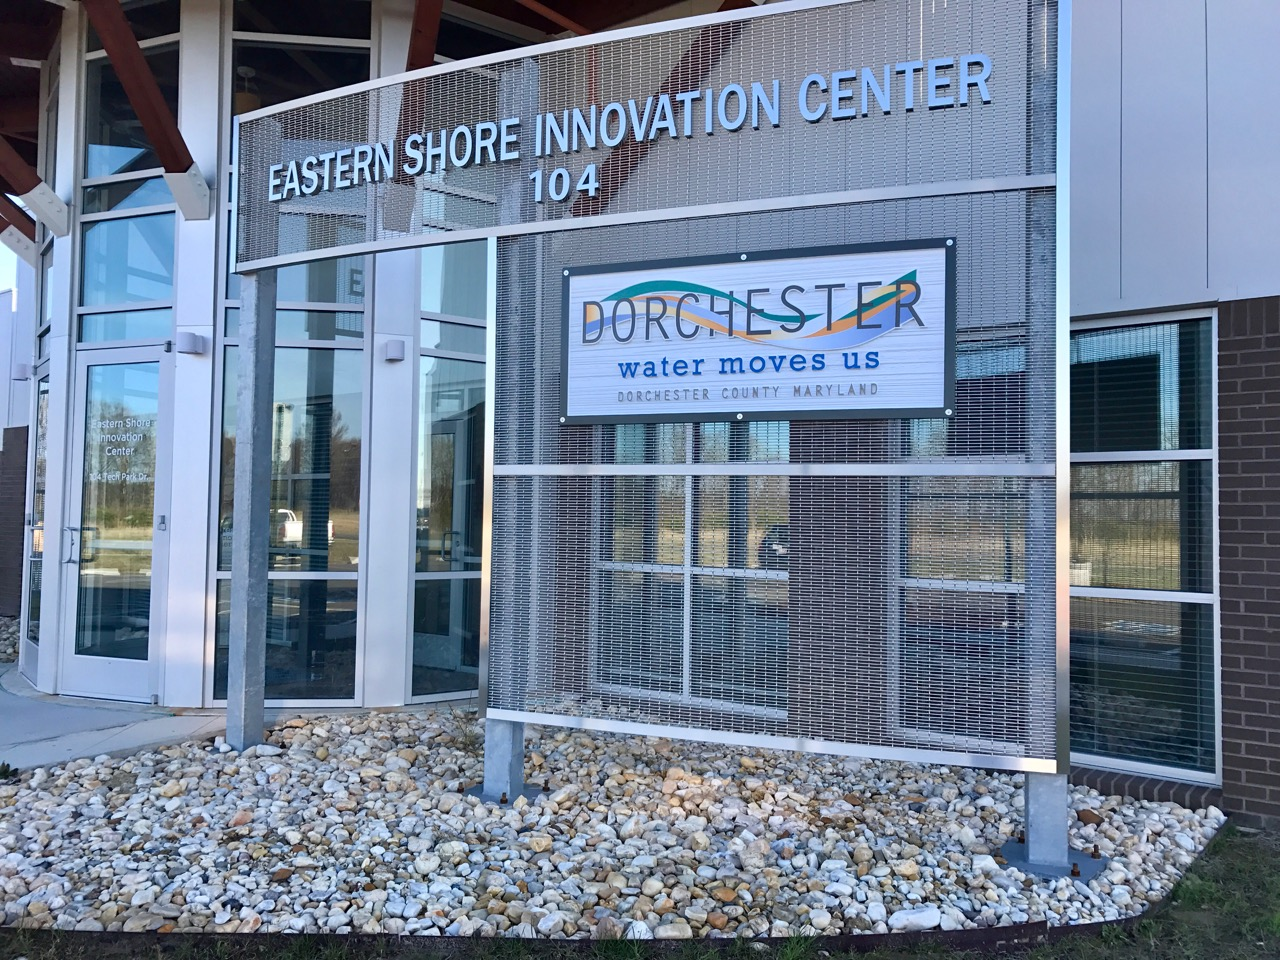 Eastern Shore Innovation Center Exterior_ChooseDorchester